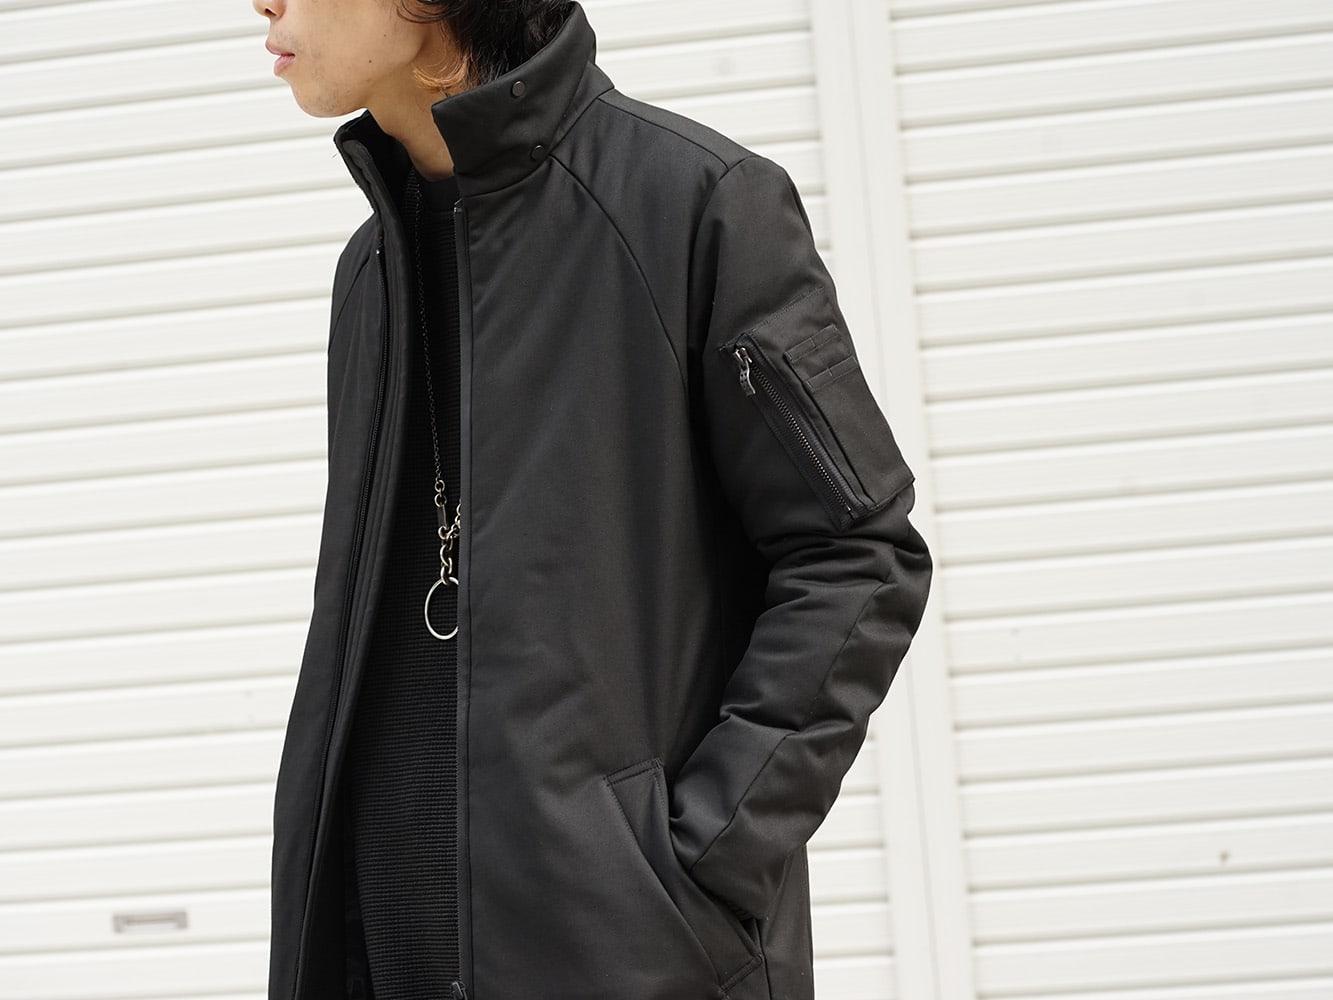 DEVOA x 11 by BBS Down Coat Style 07